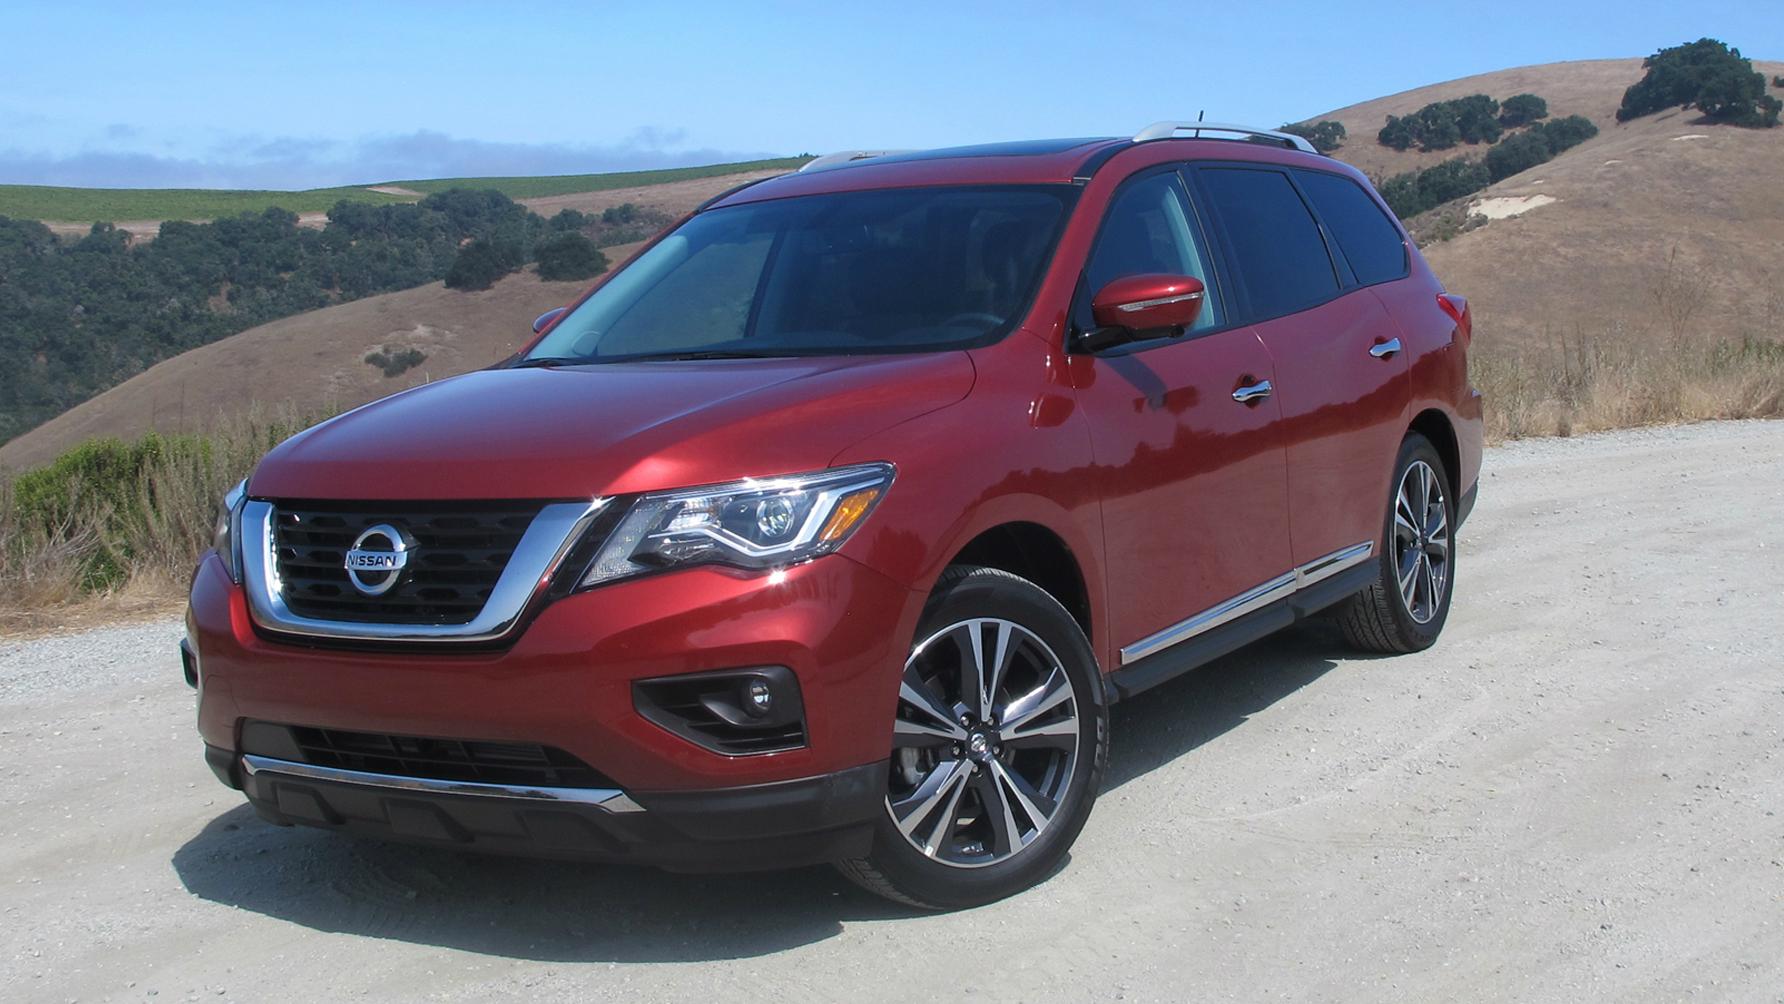 Nissan Pathfinder 2017 pricing